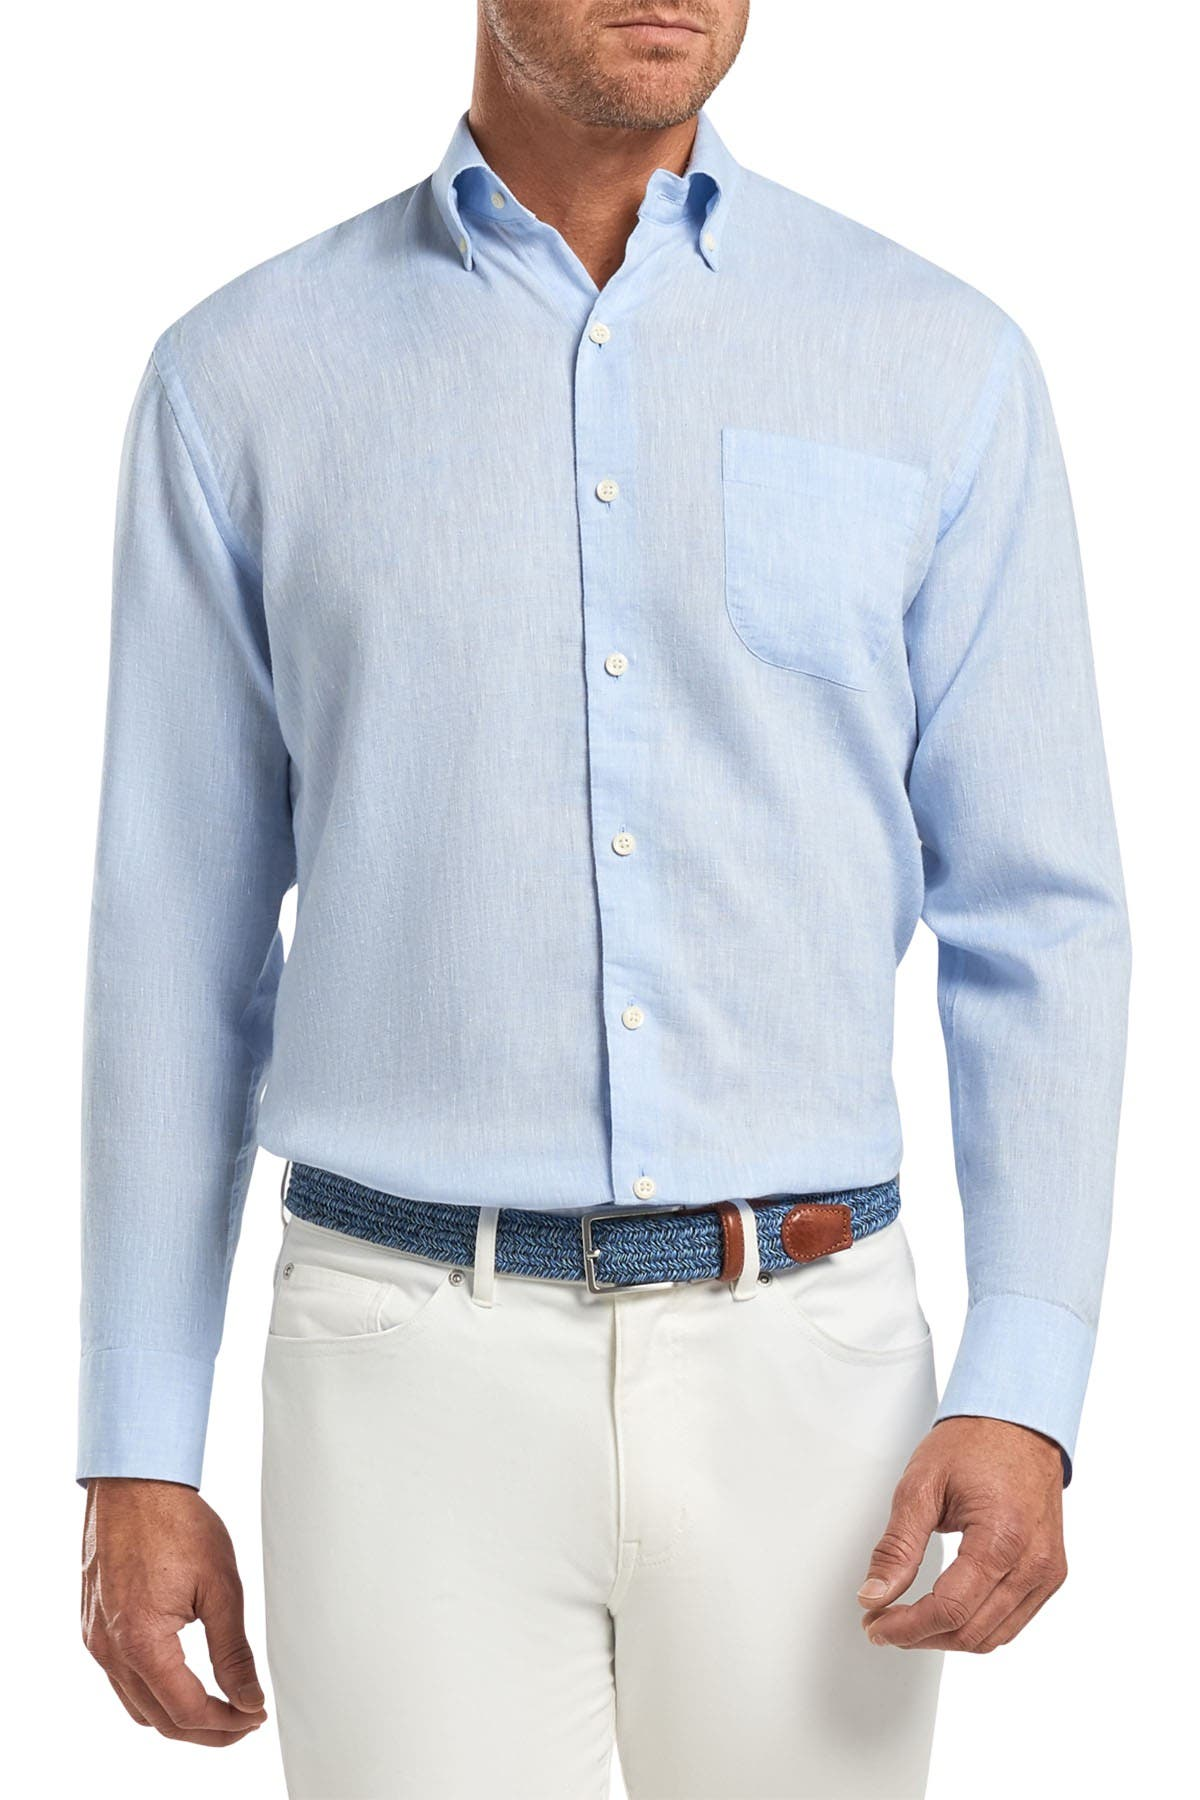 Image of Peter Millar Sardinia Solid Classic Fit Shirt